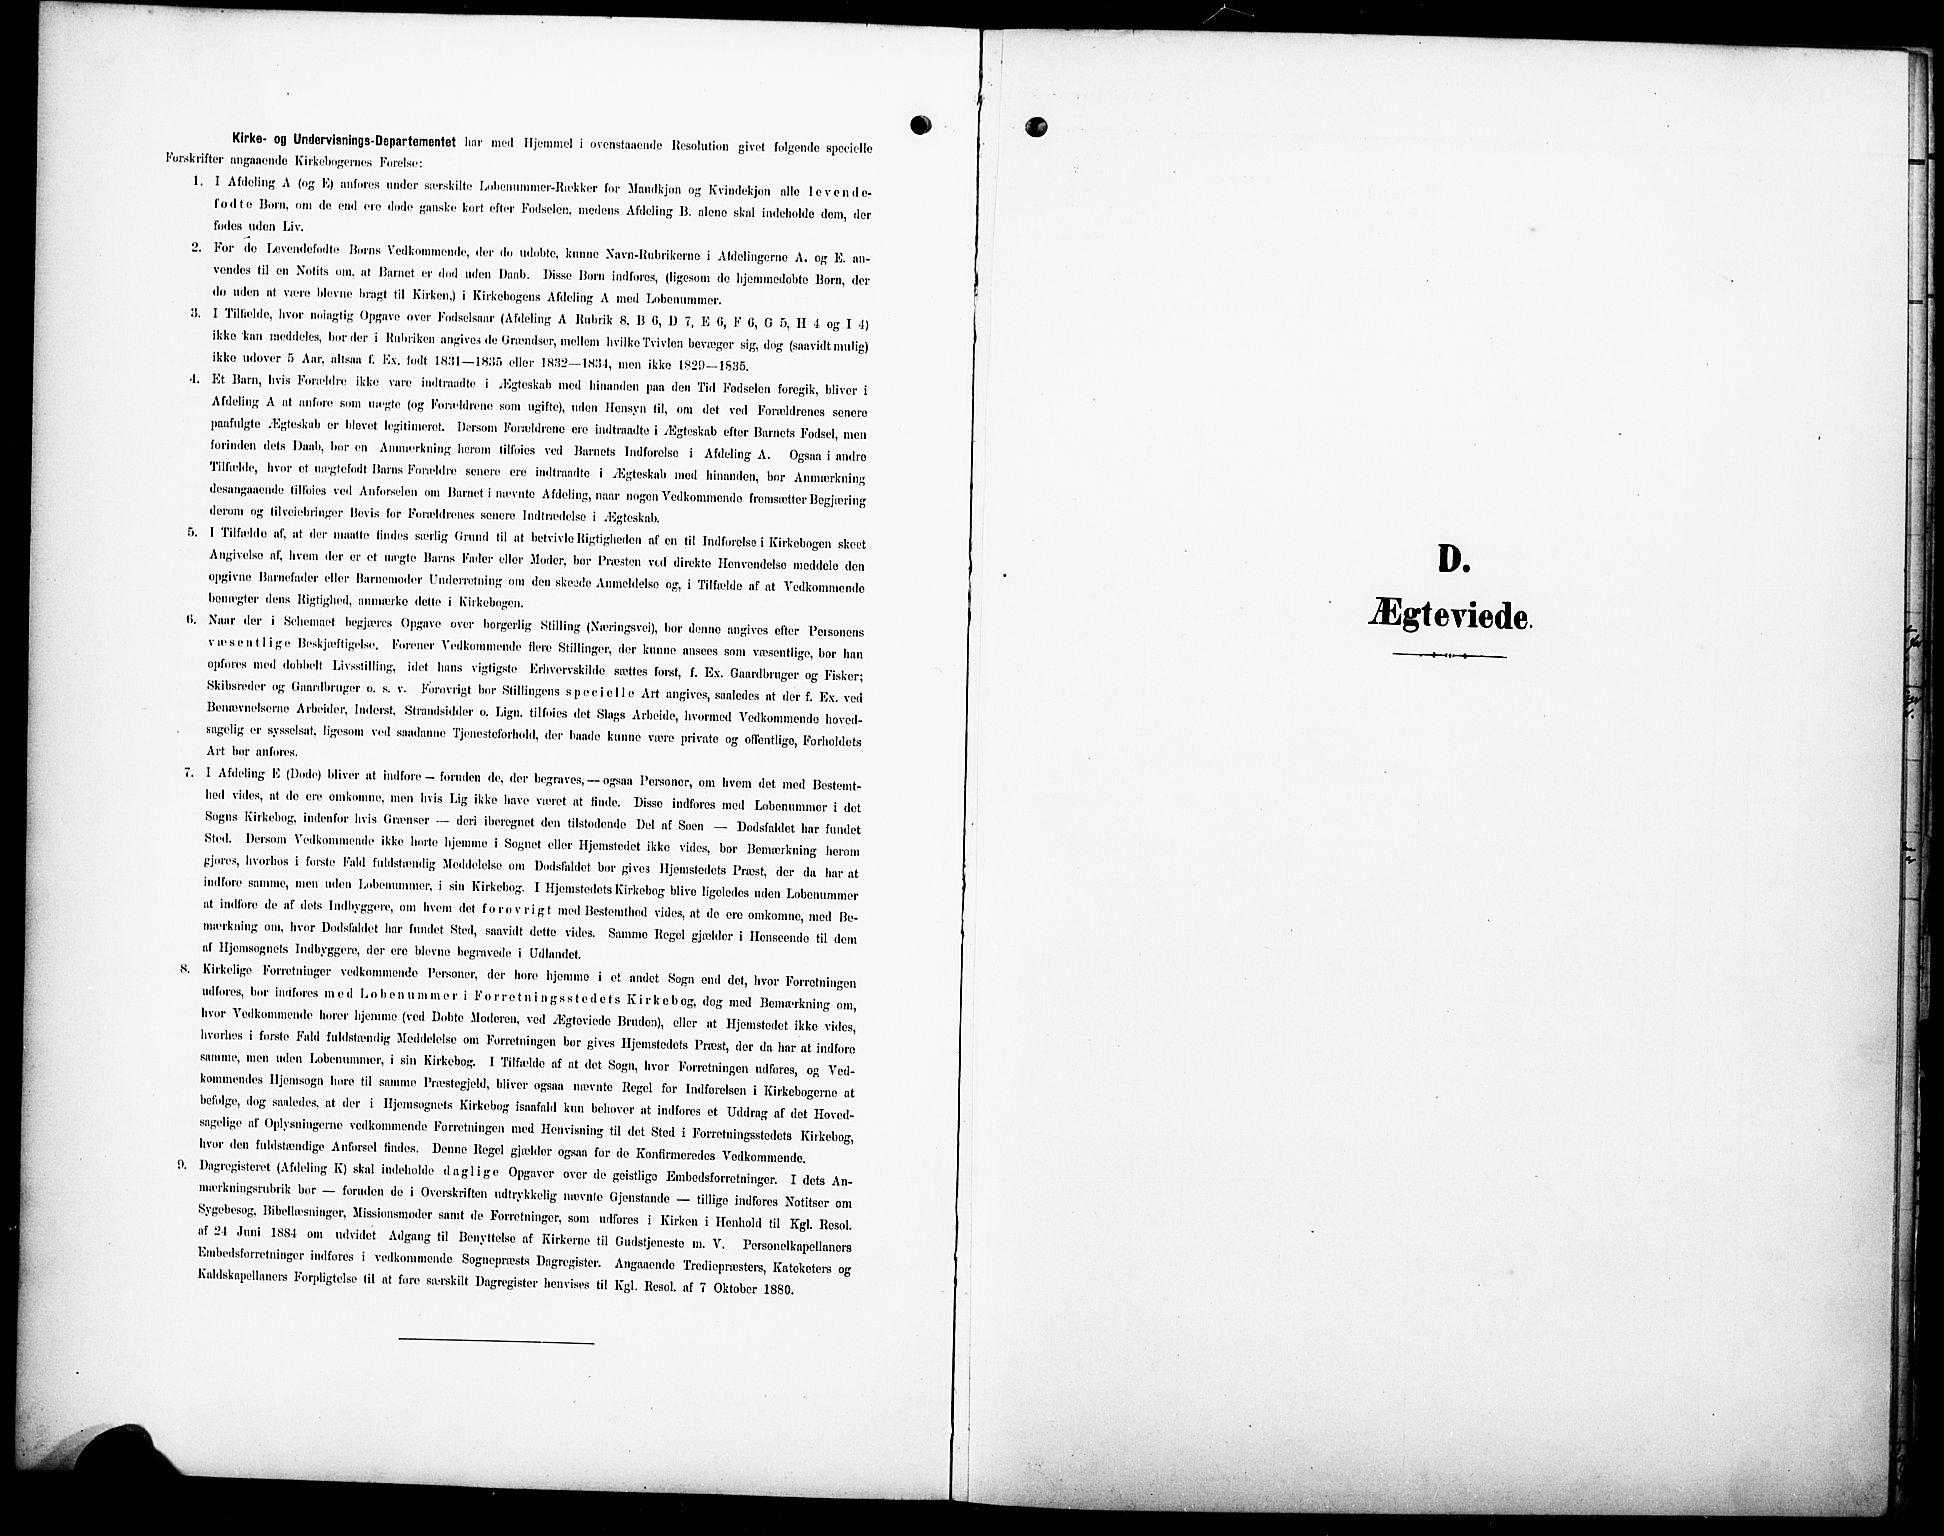 SAO, Petrus prestekontor Kirkebøker, F/Fa/L0007: Ministerialbok nr. 7, 1898-1900